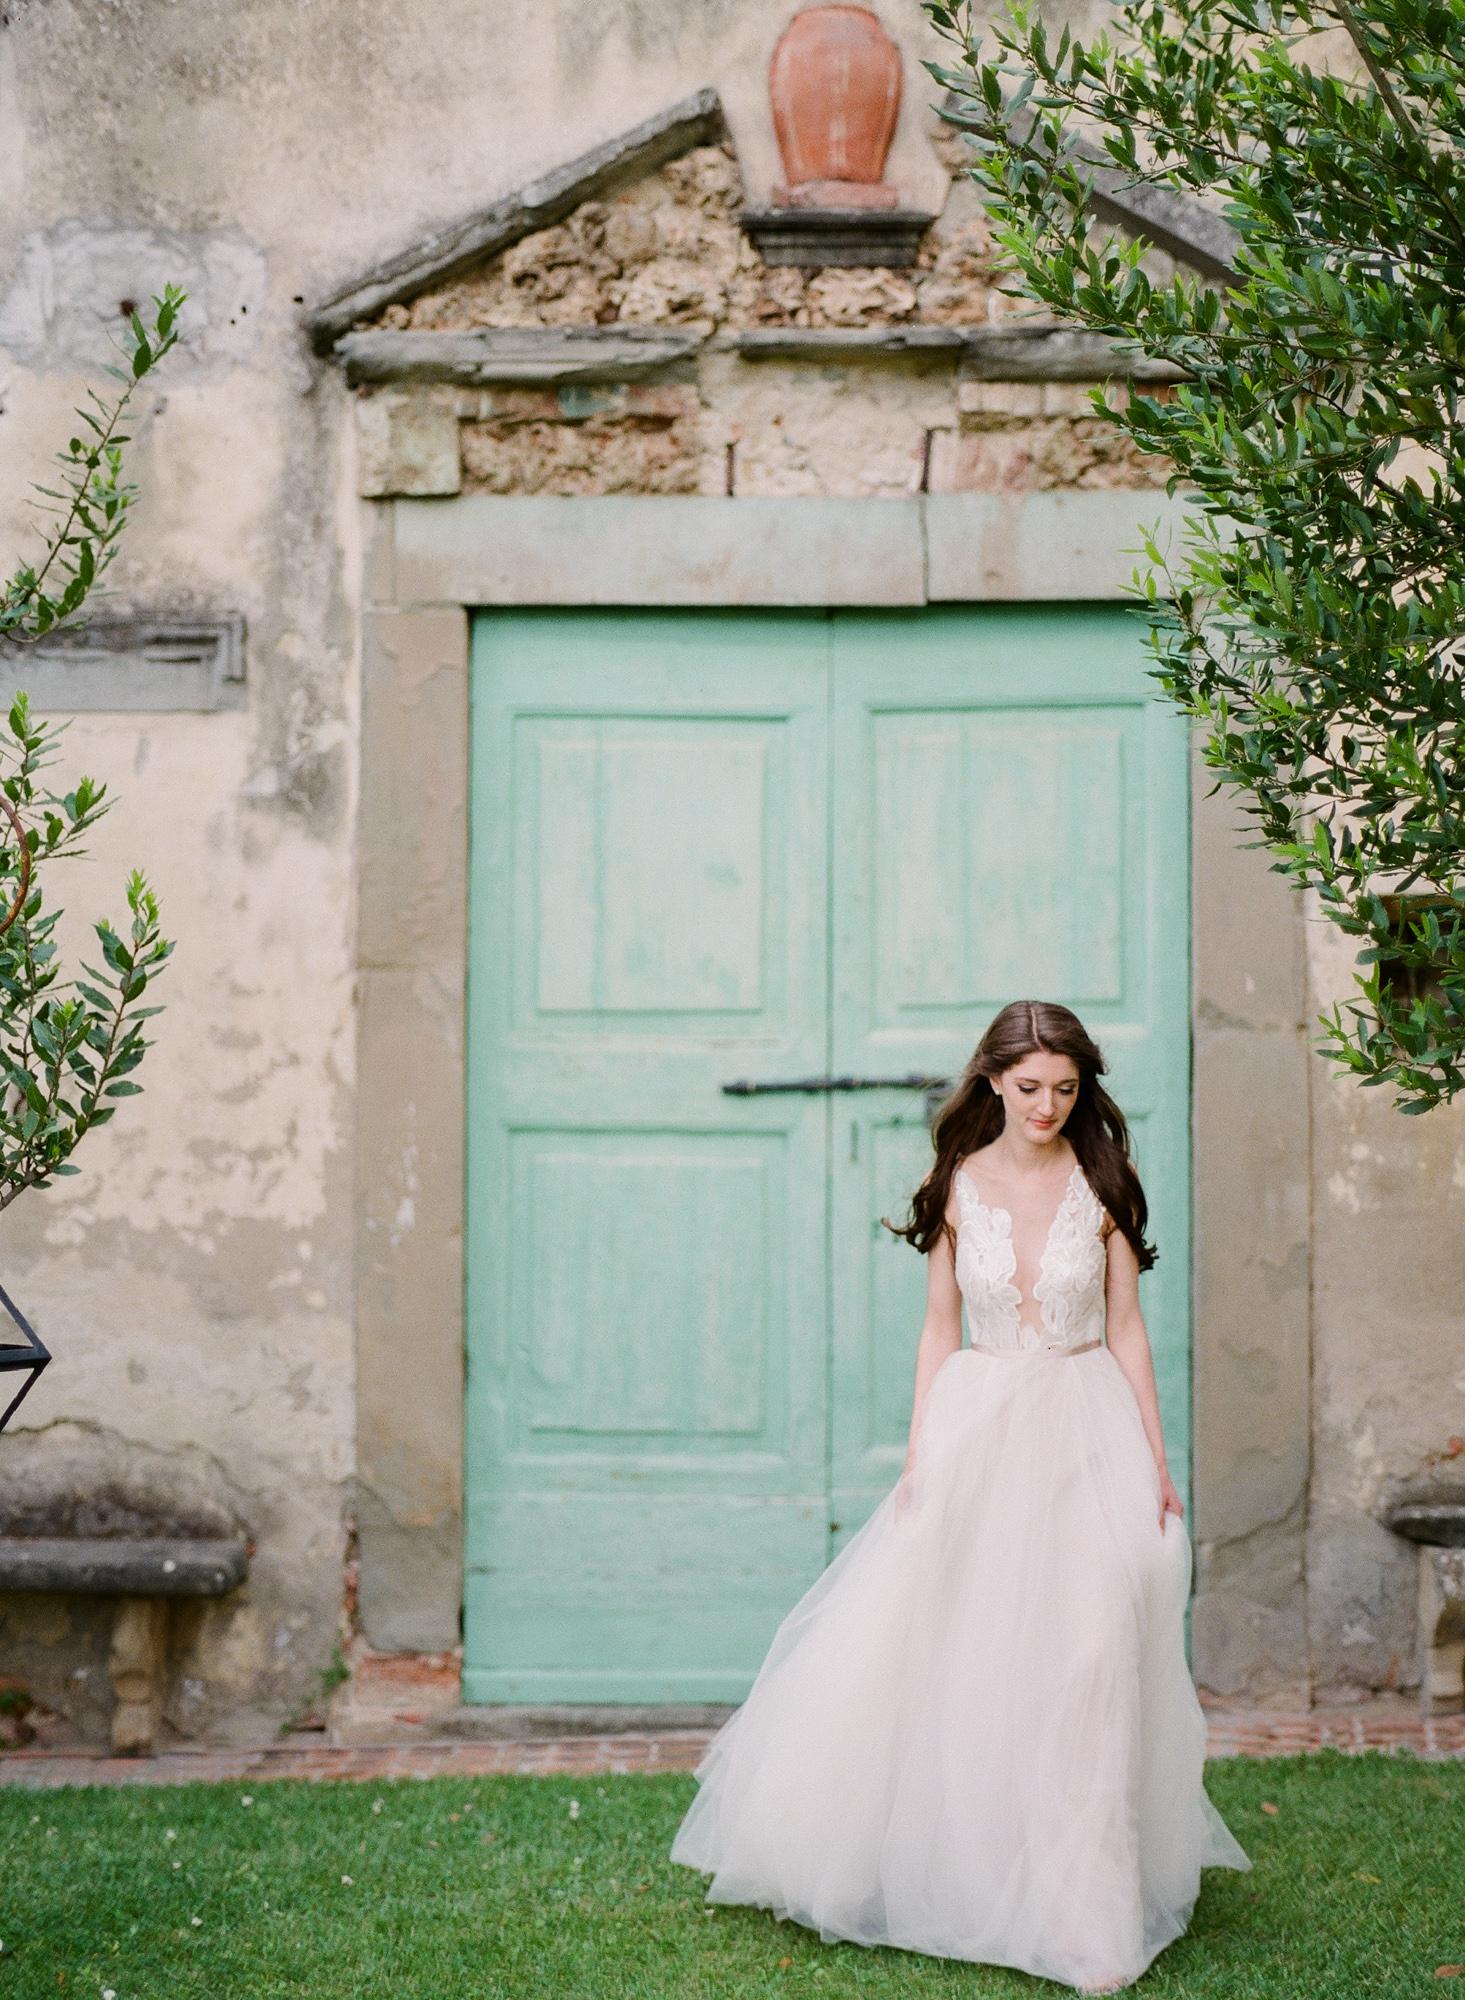 Tuscany-Wedding-Venues-09.jpg